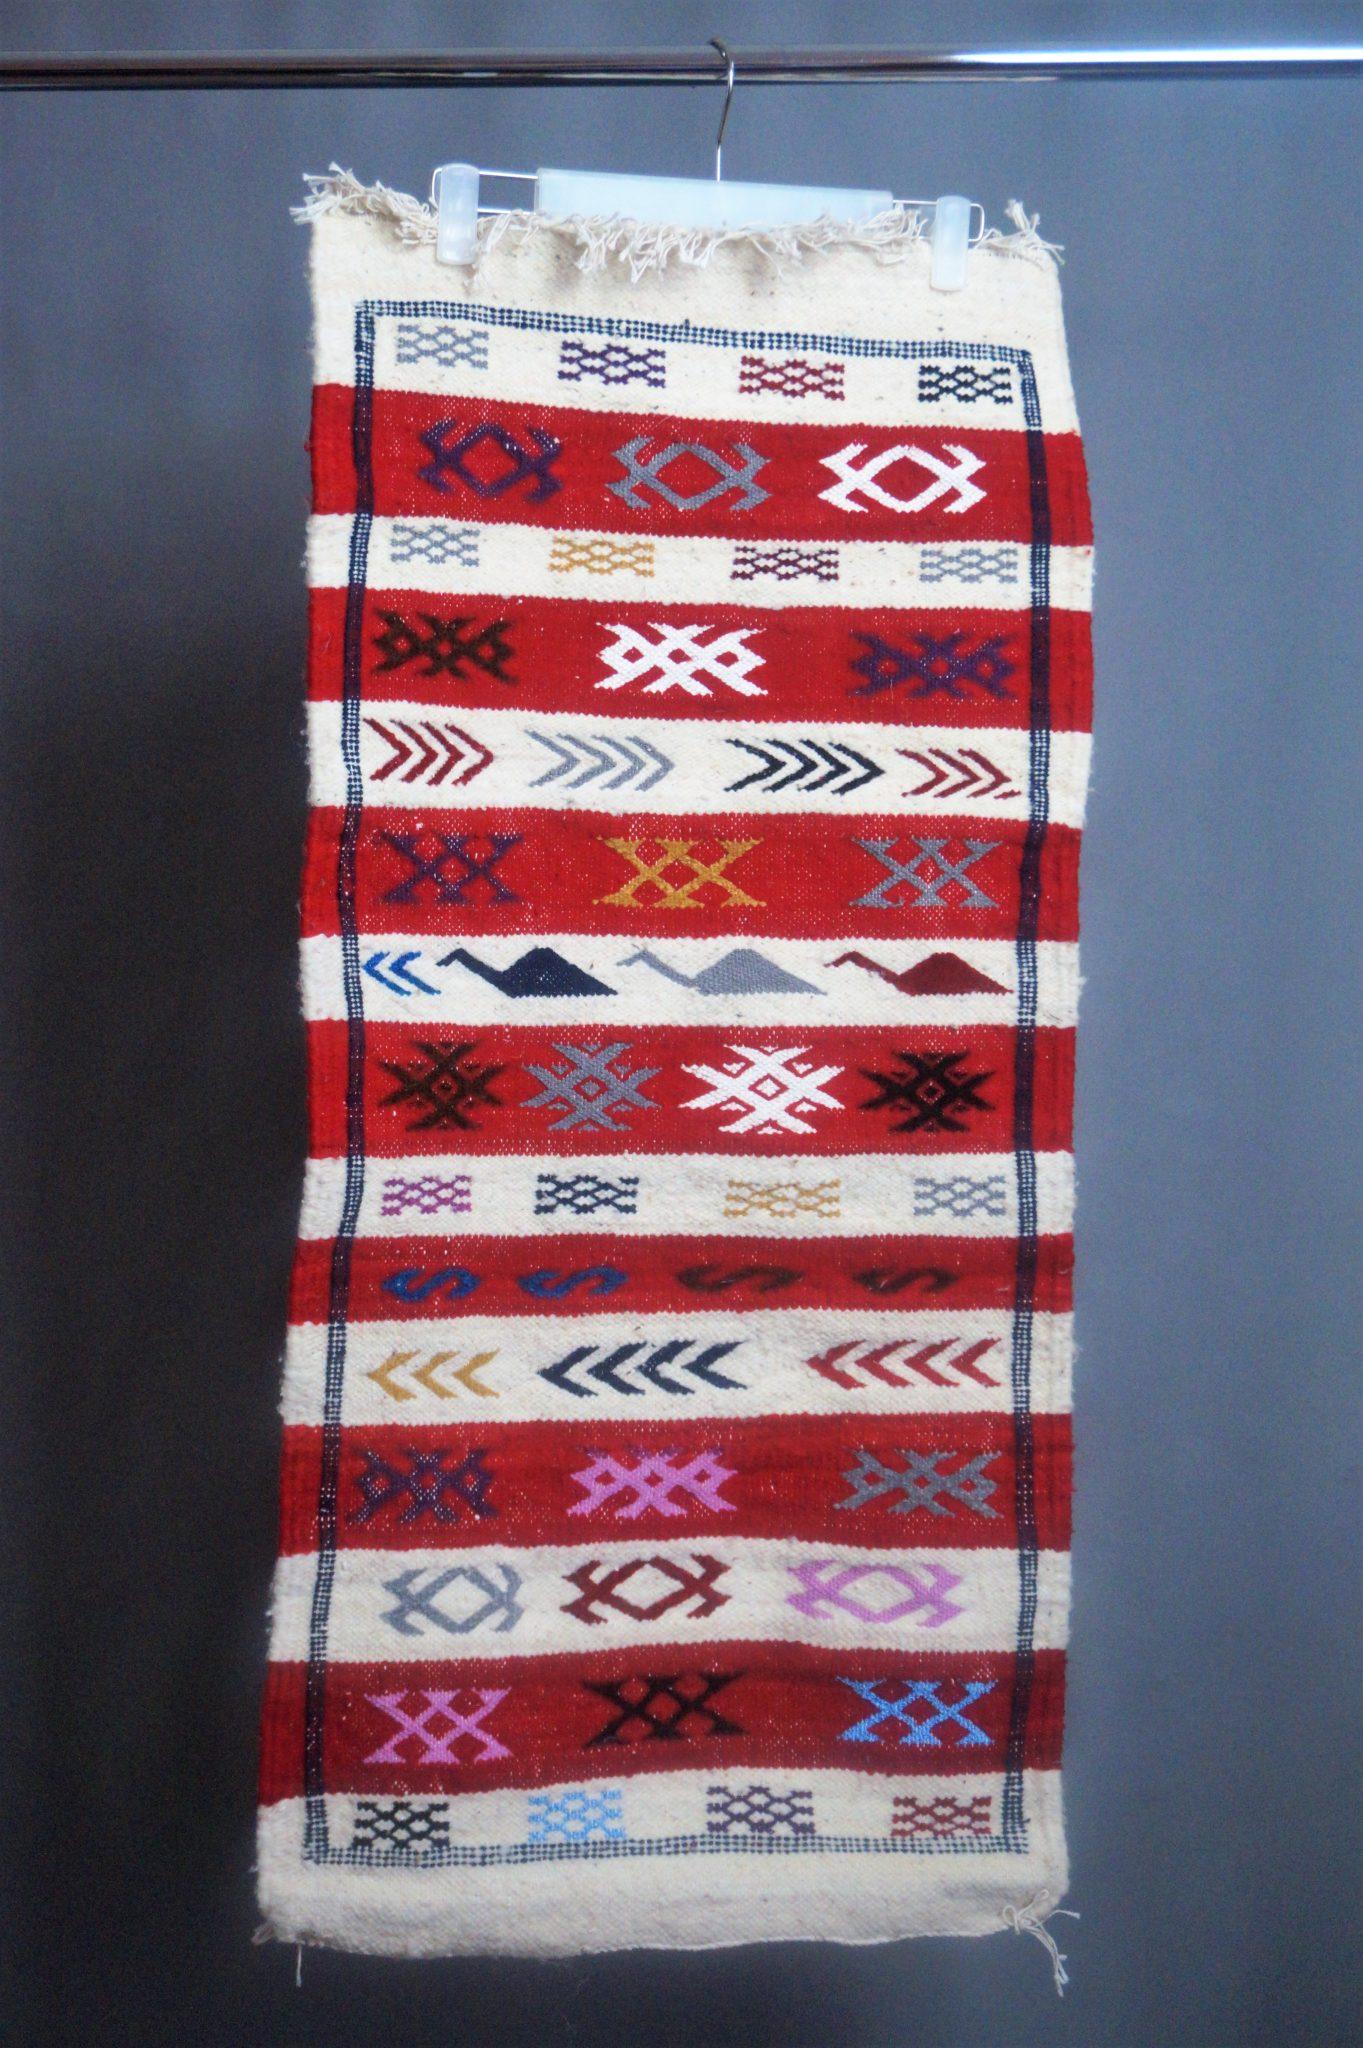 5d1d4162ff9b2b Berber kleed - Rood Wit - Ça Rout Morocco Kleding - Accessoires ...